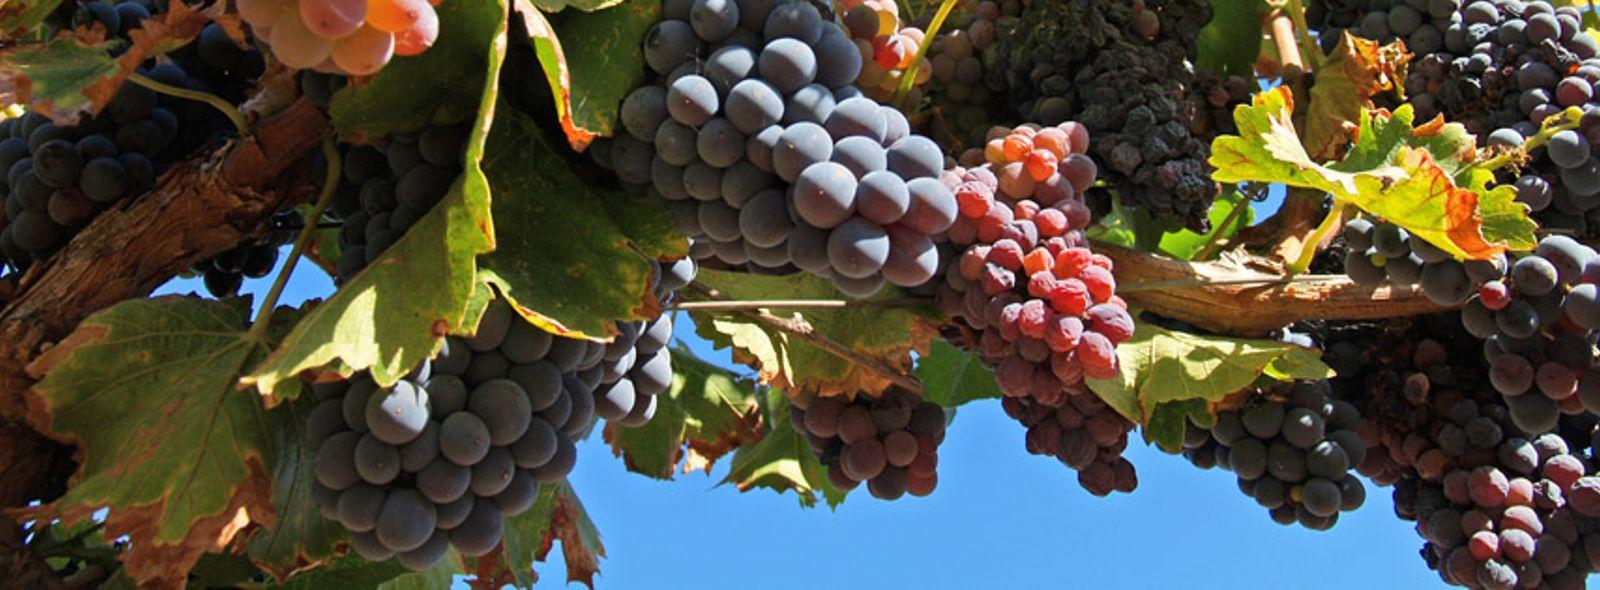 Itinerario degustazione vini Sardegna